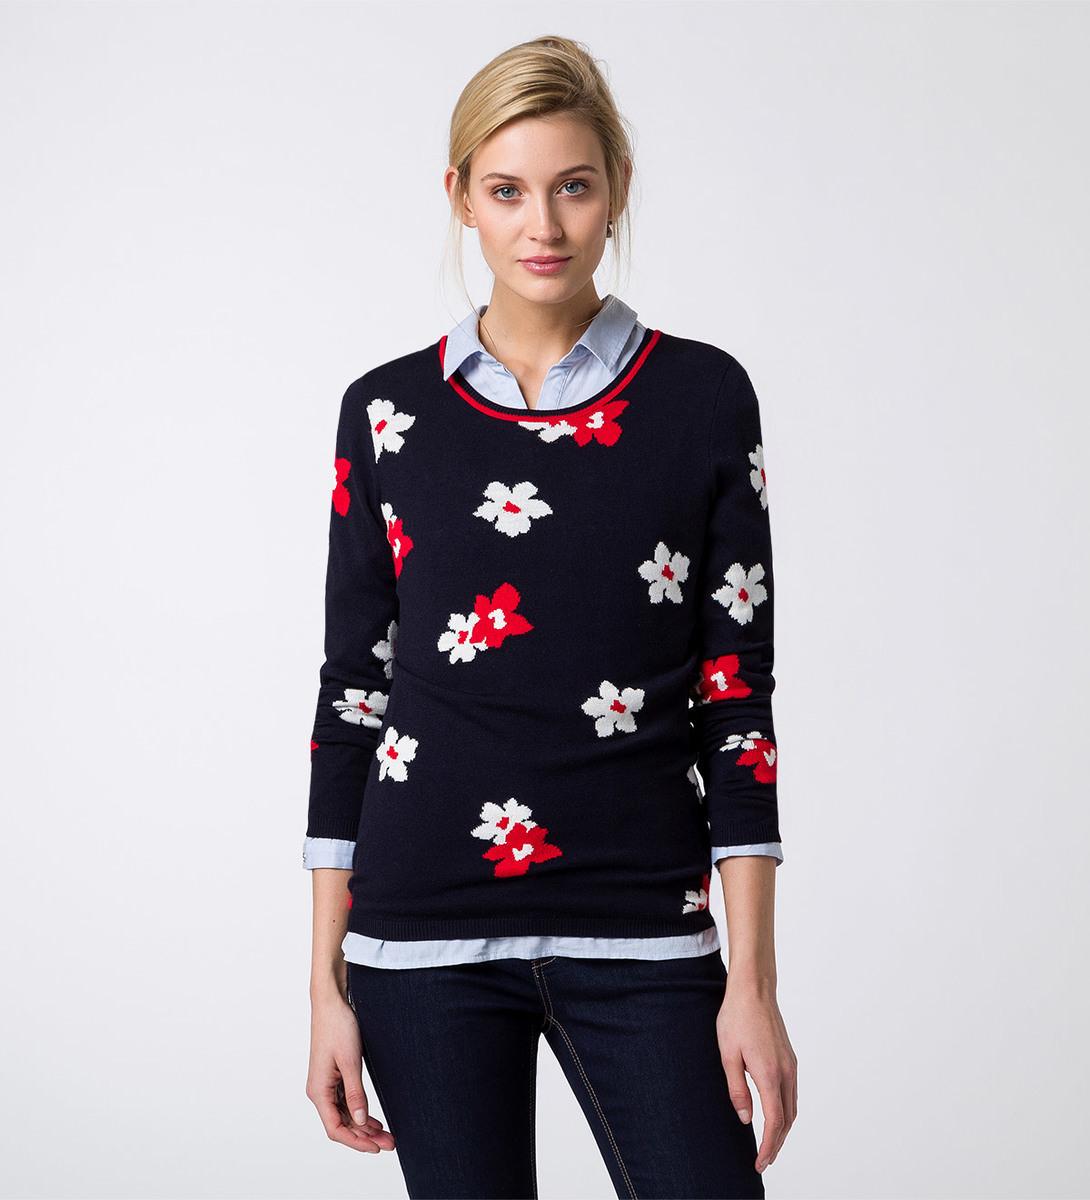 Pullover mit floralem Muster in blue black